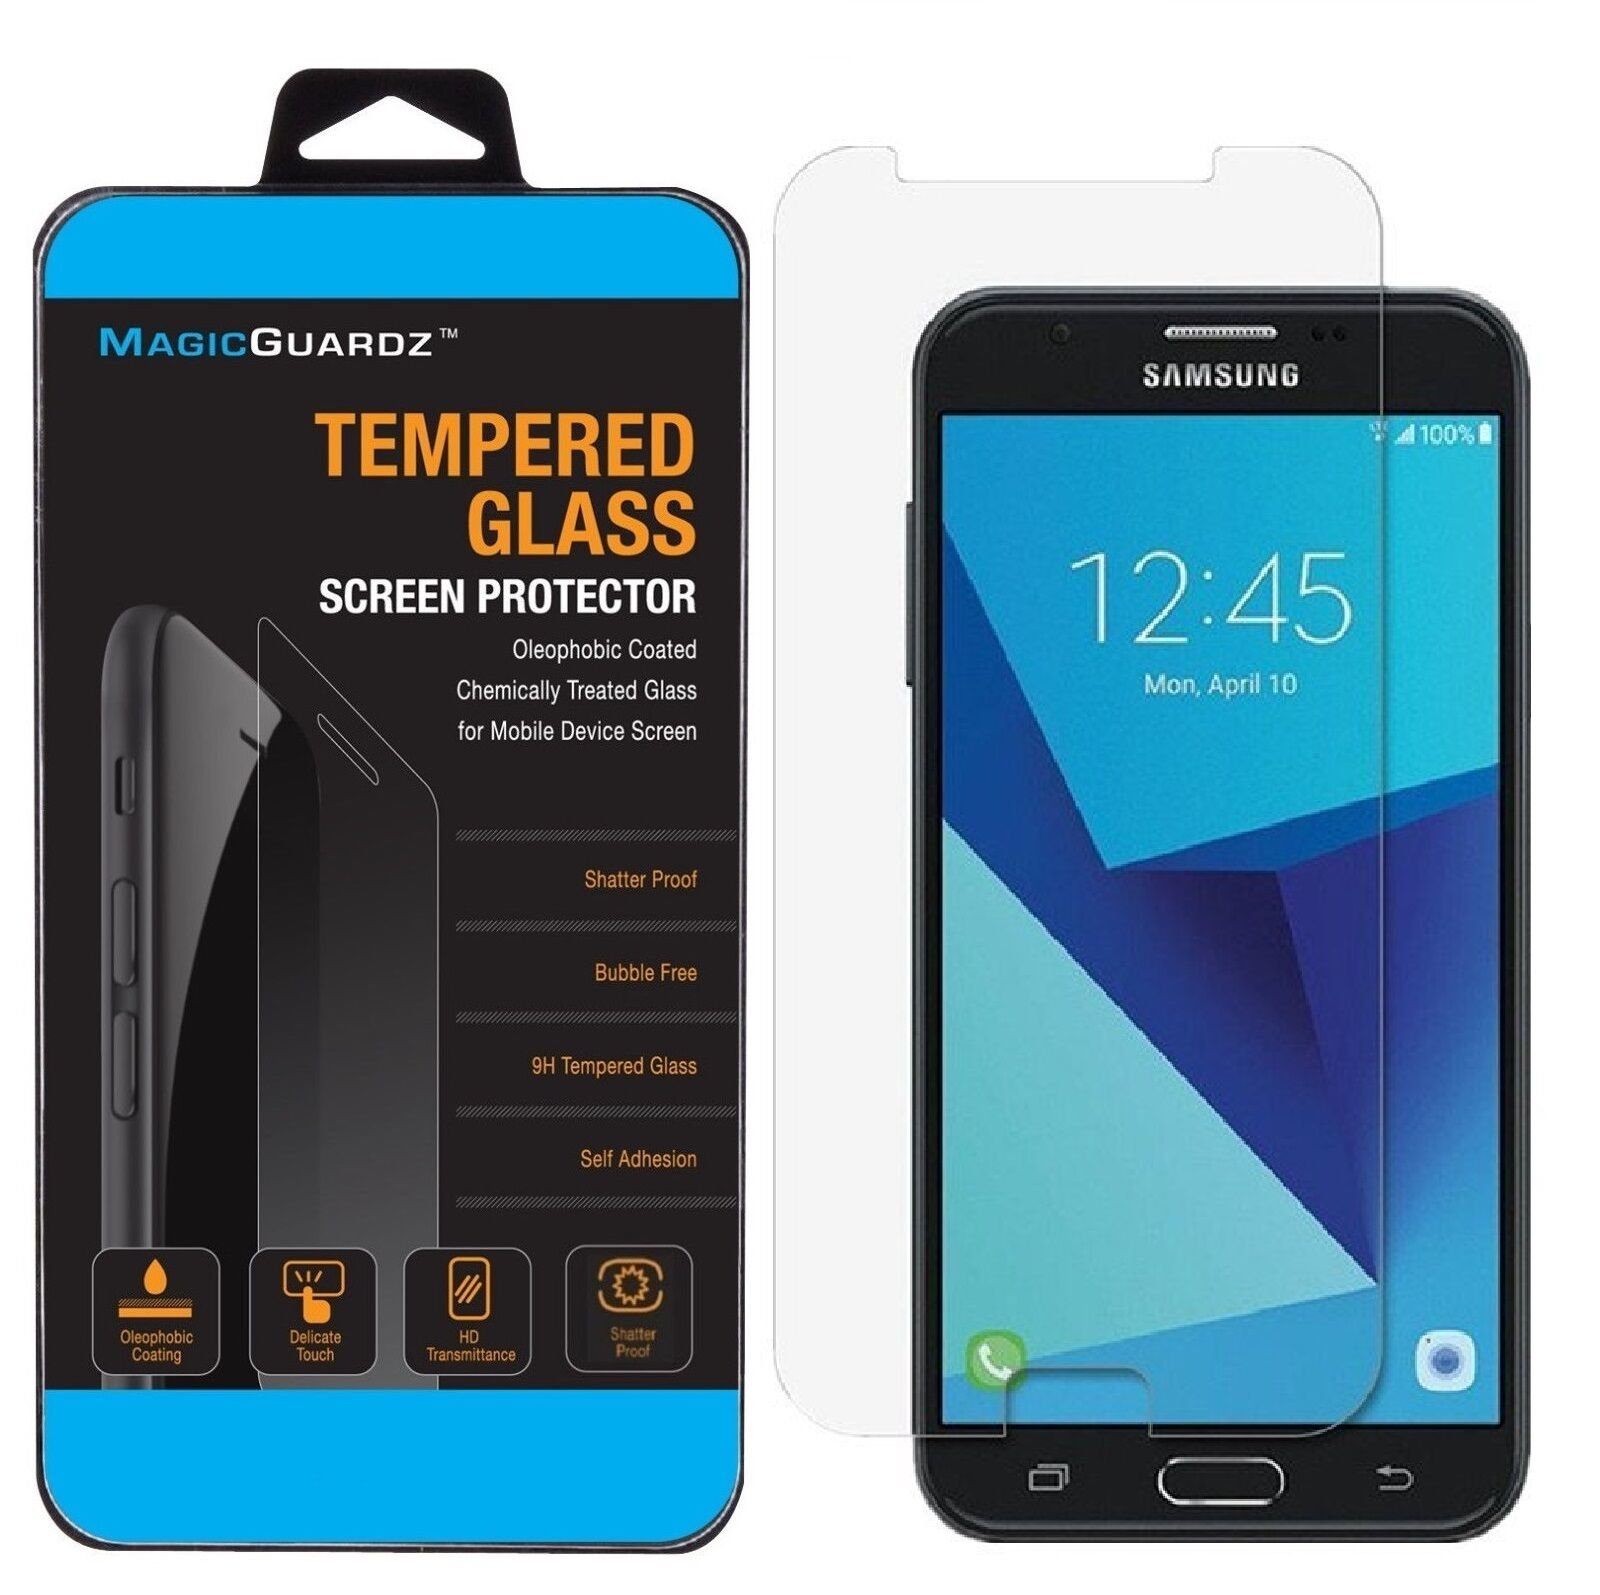 Купить For Galaxy J7 2017 / J7 Perx / J7 V / J7 Sky Pro Tempered Glass Screen Protector